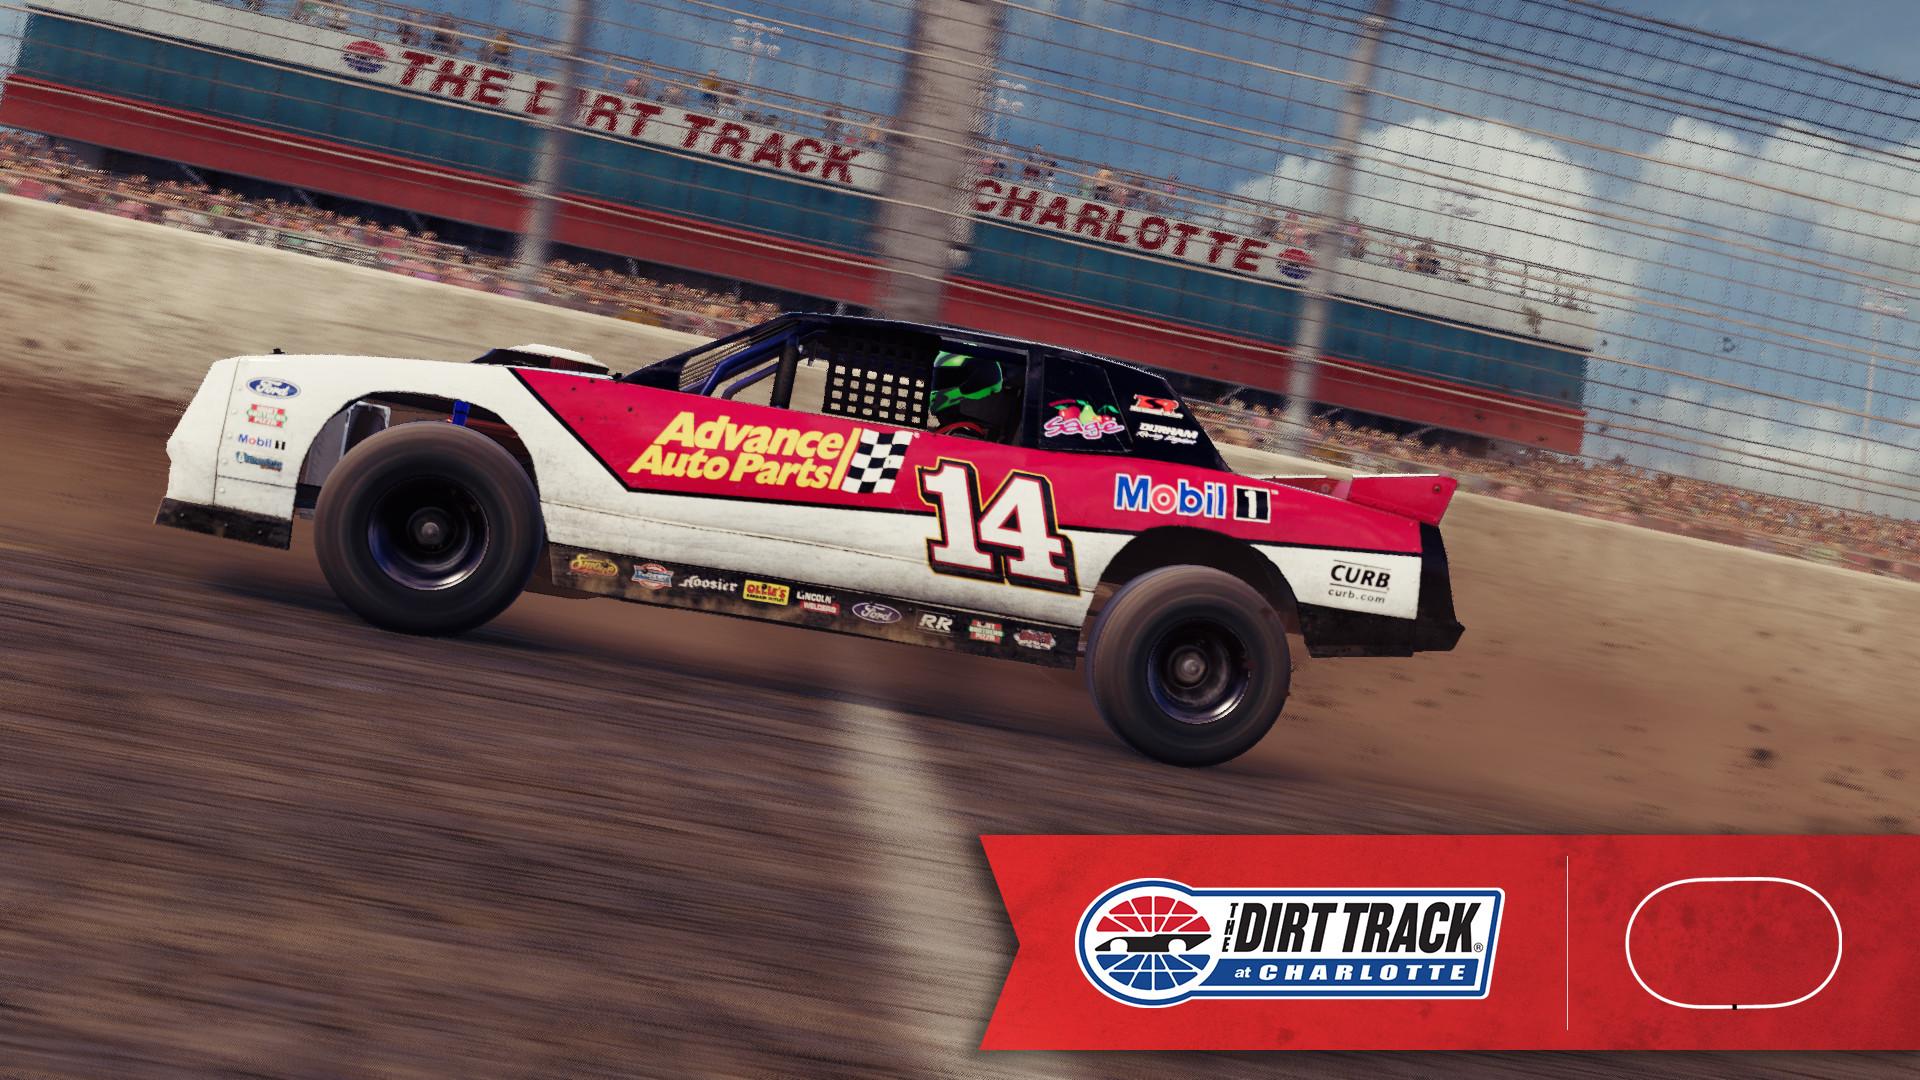 Tony Stewart's All-American Racing: The Dirt Track at Charlotte screenshot